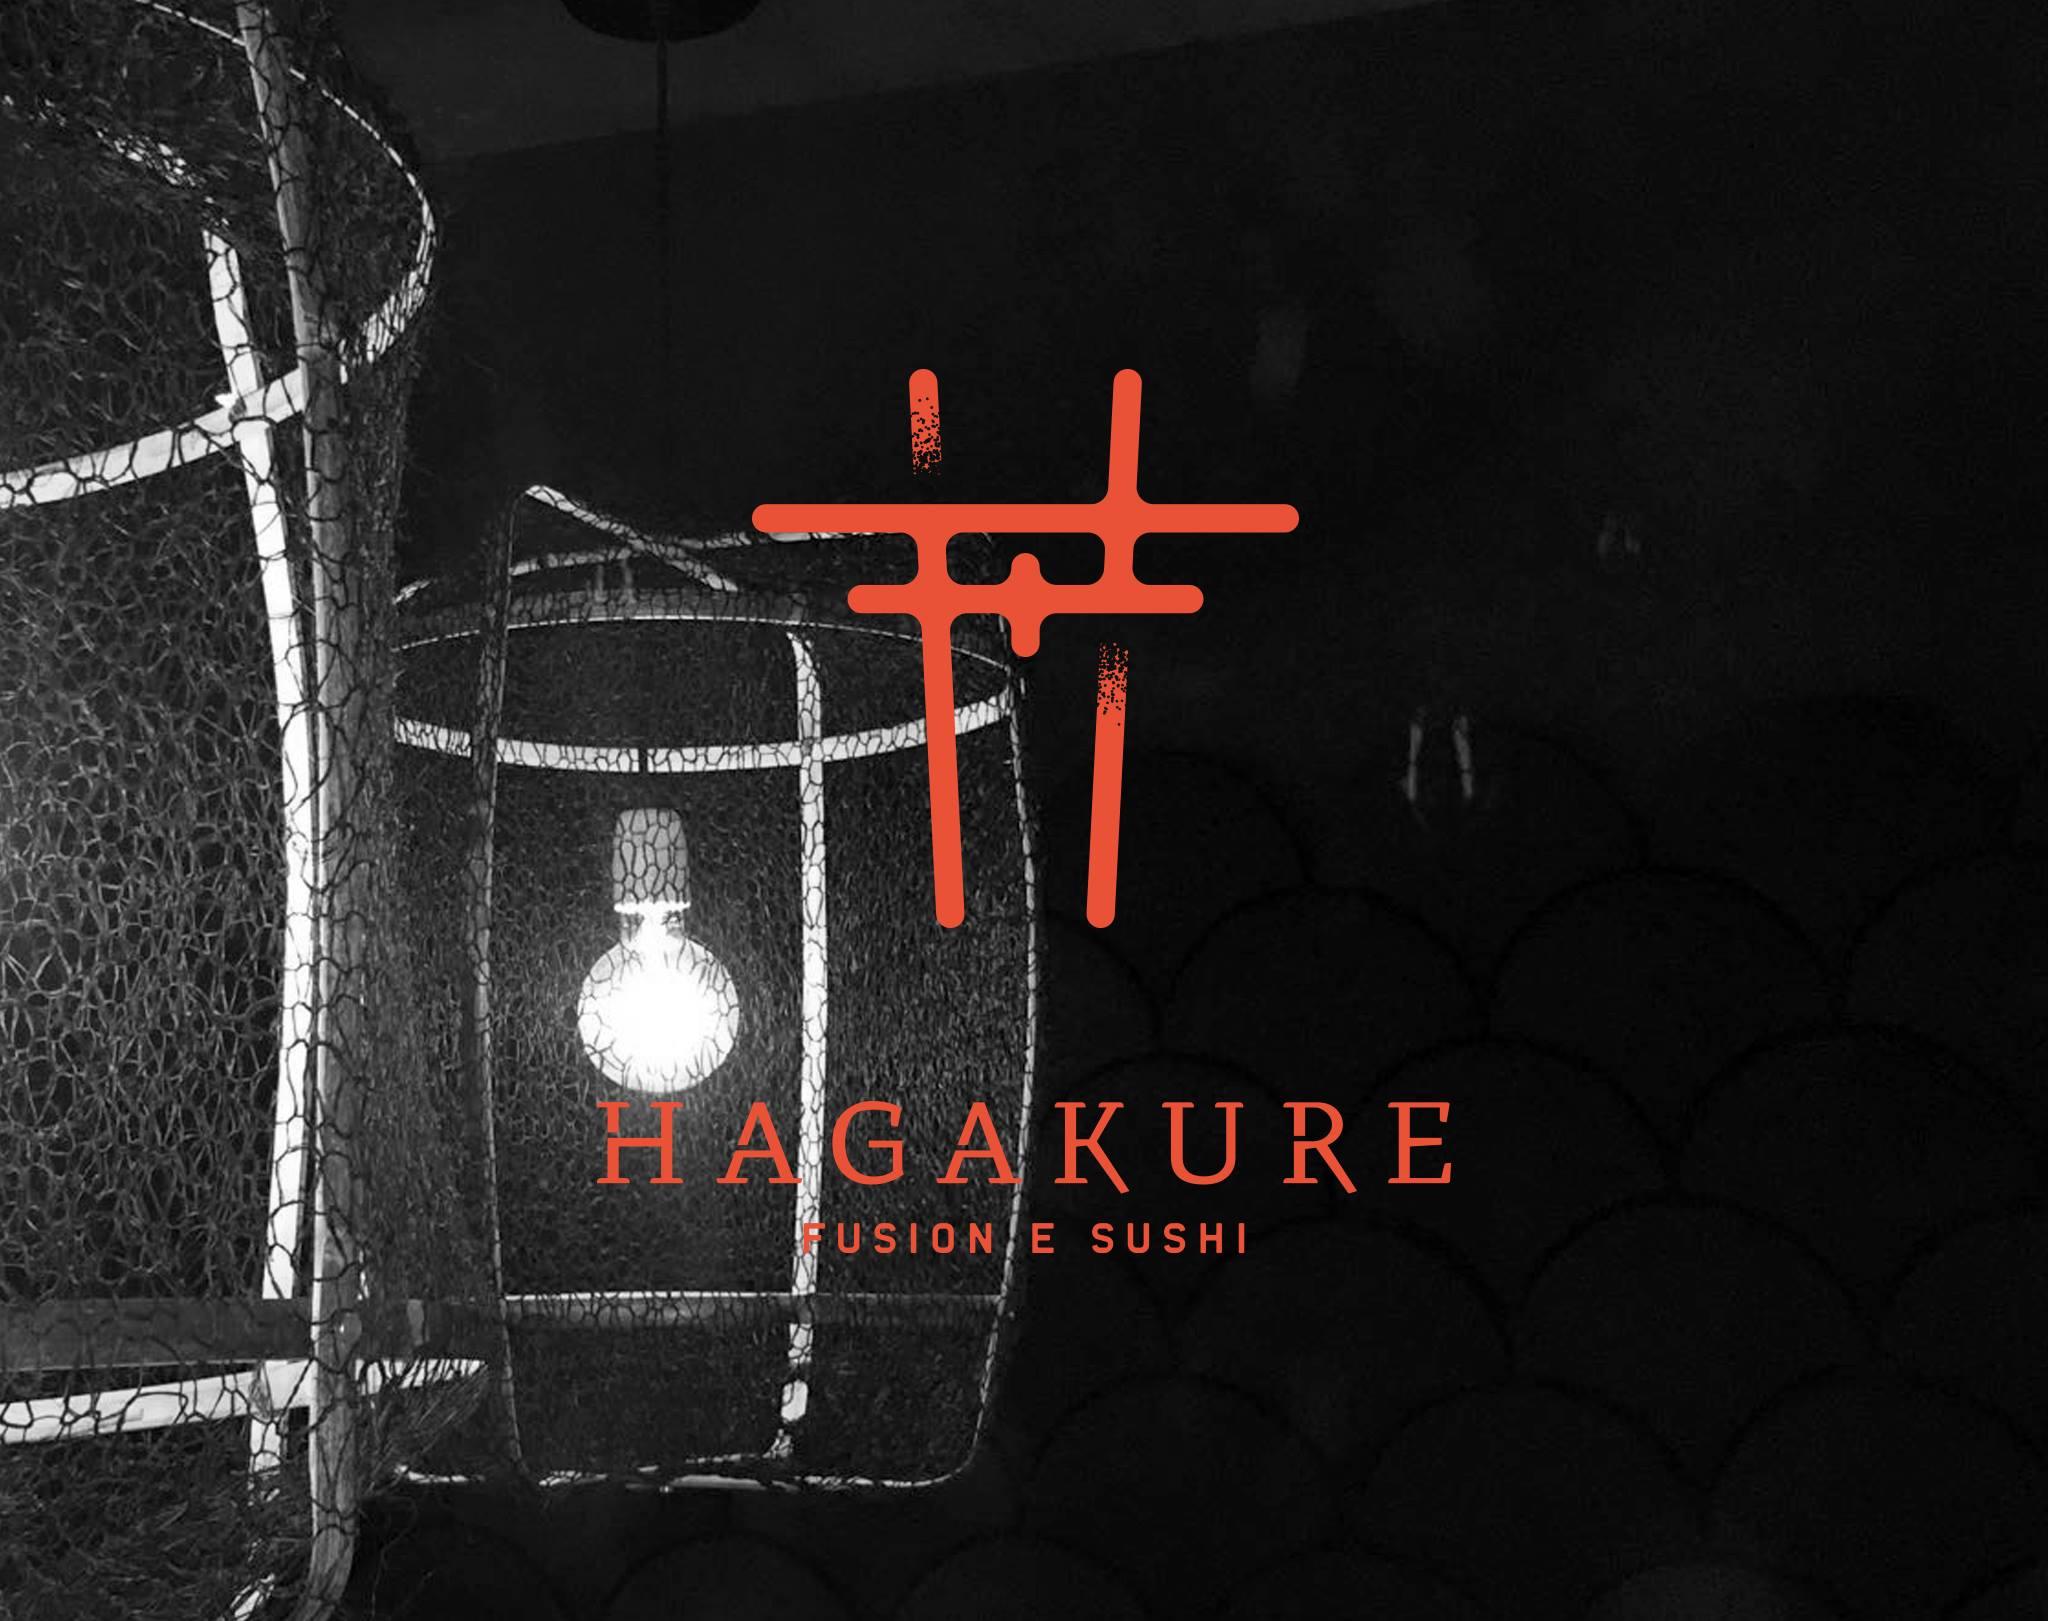 RE-OPENING | HAGAKURE - BARI AMENDOLA